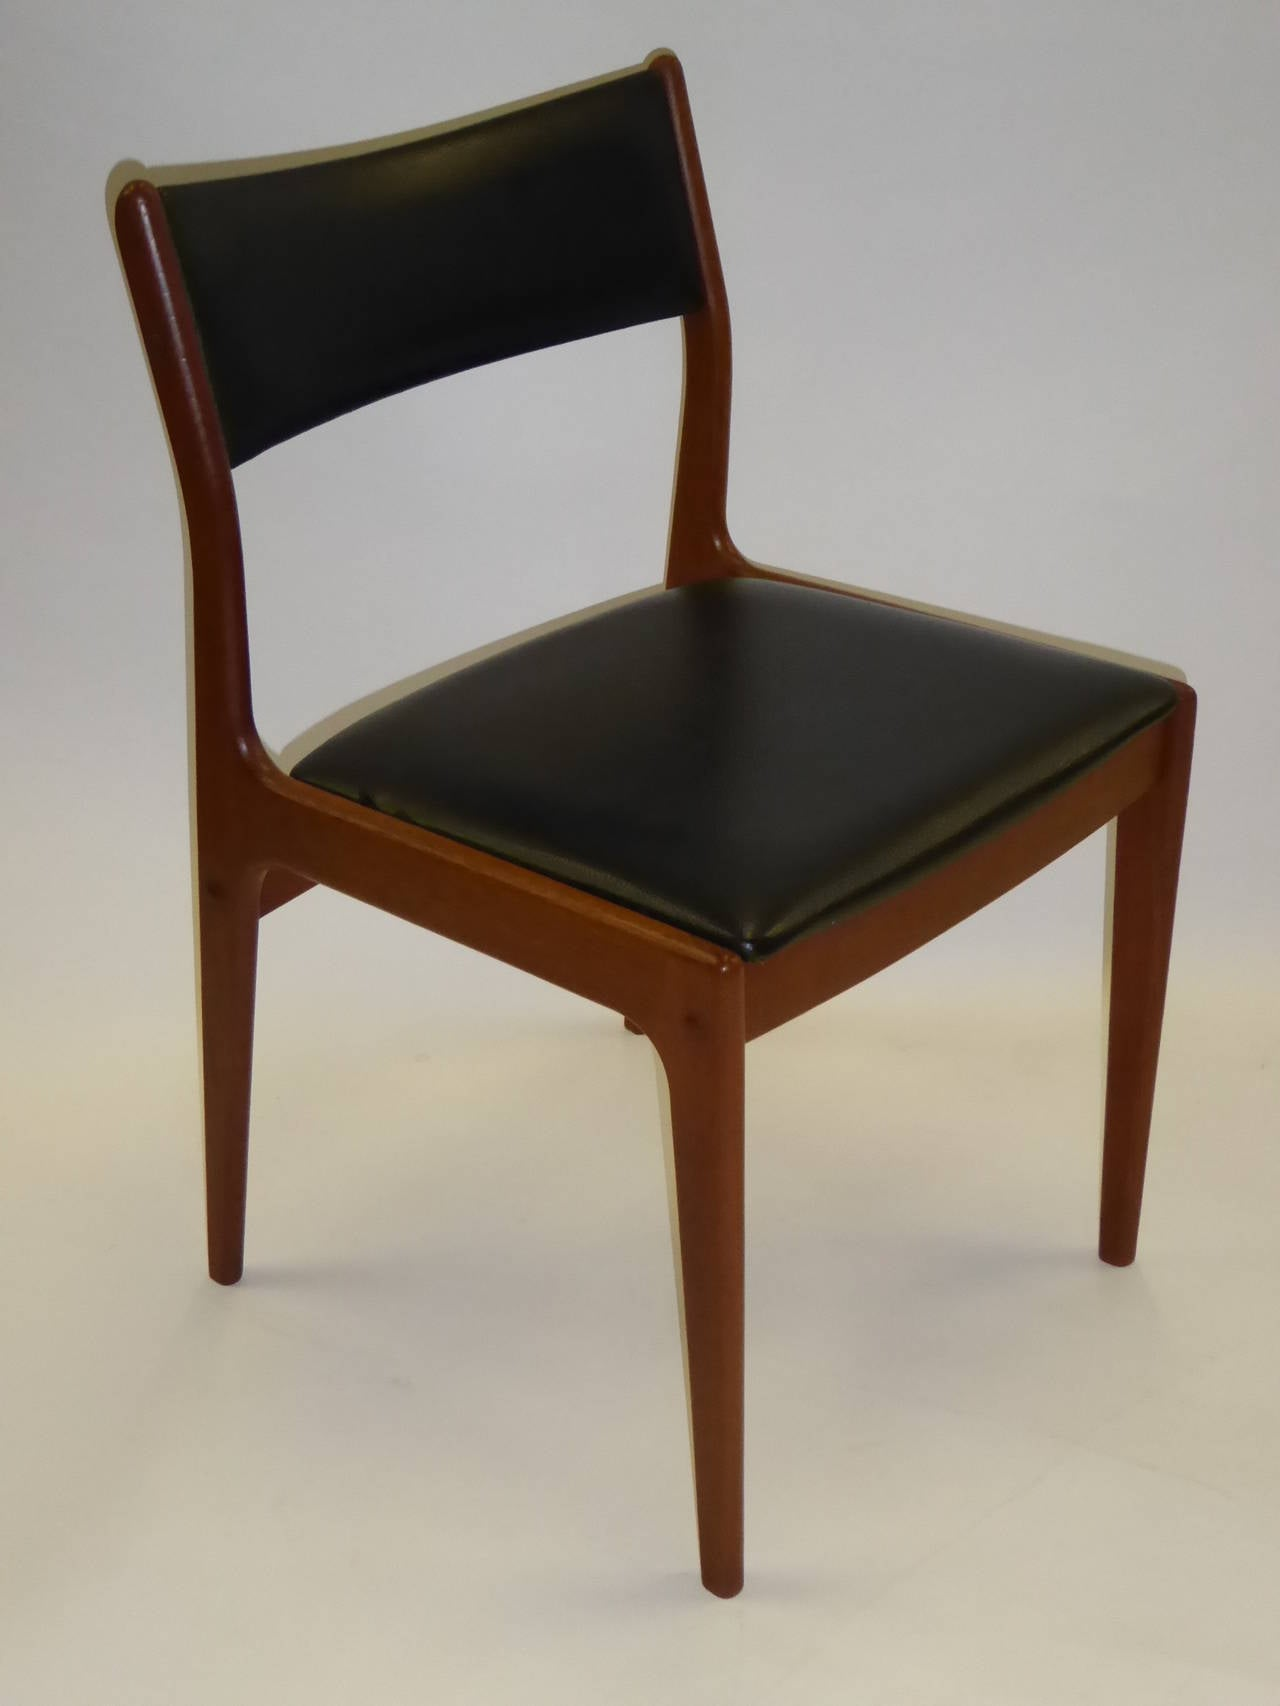 Dining Room Seat Cushions Johannes Andersen For Uldum Mobelfabrik Danish Teak Dining